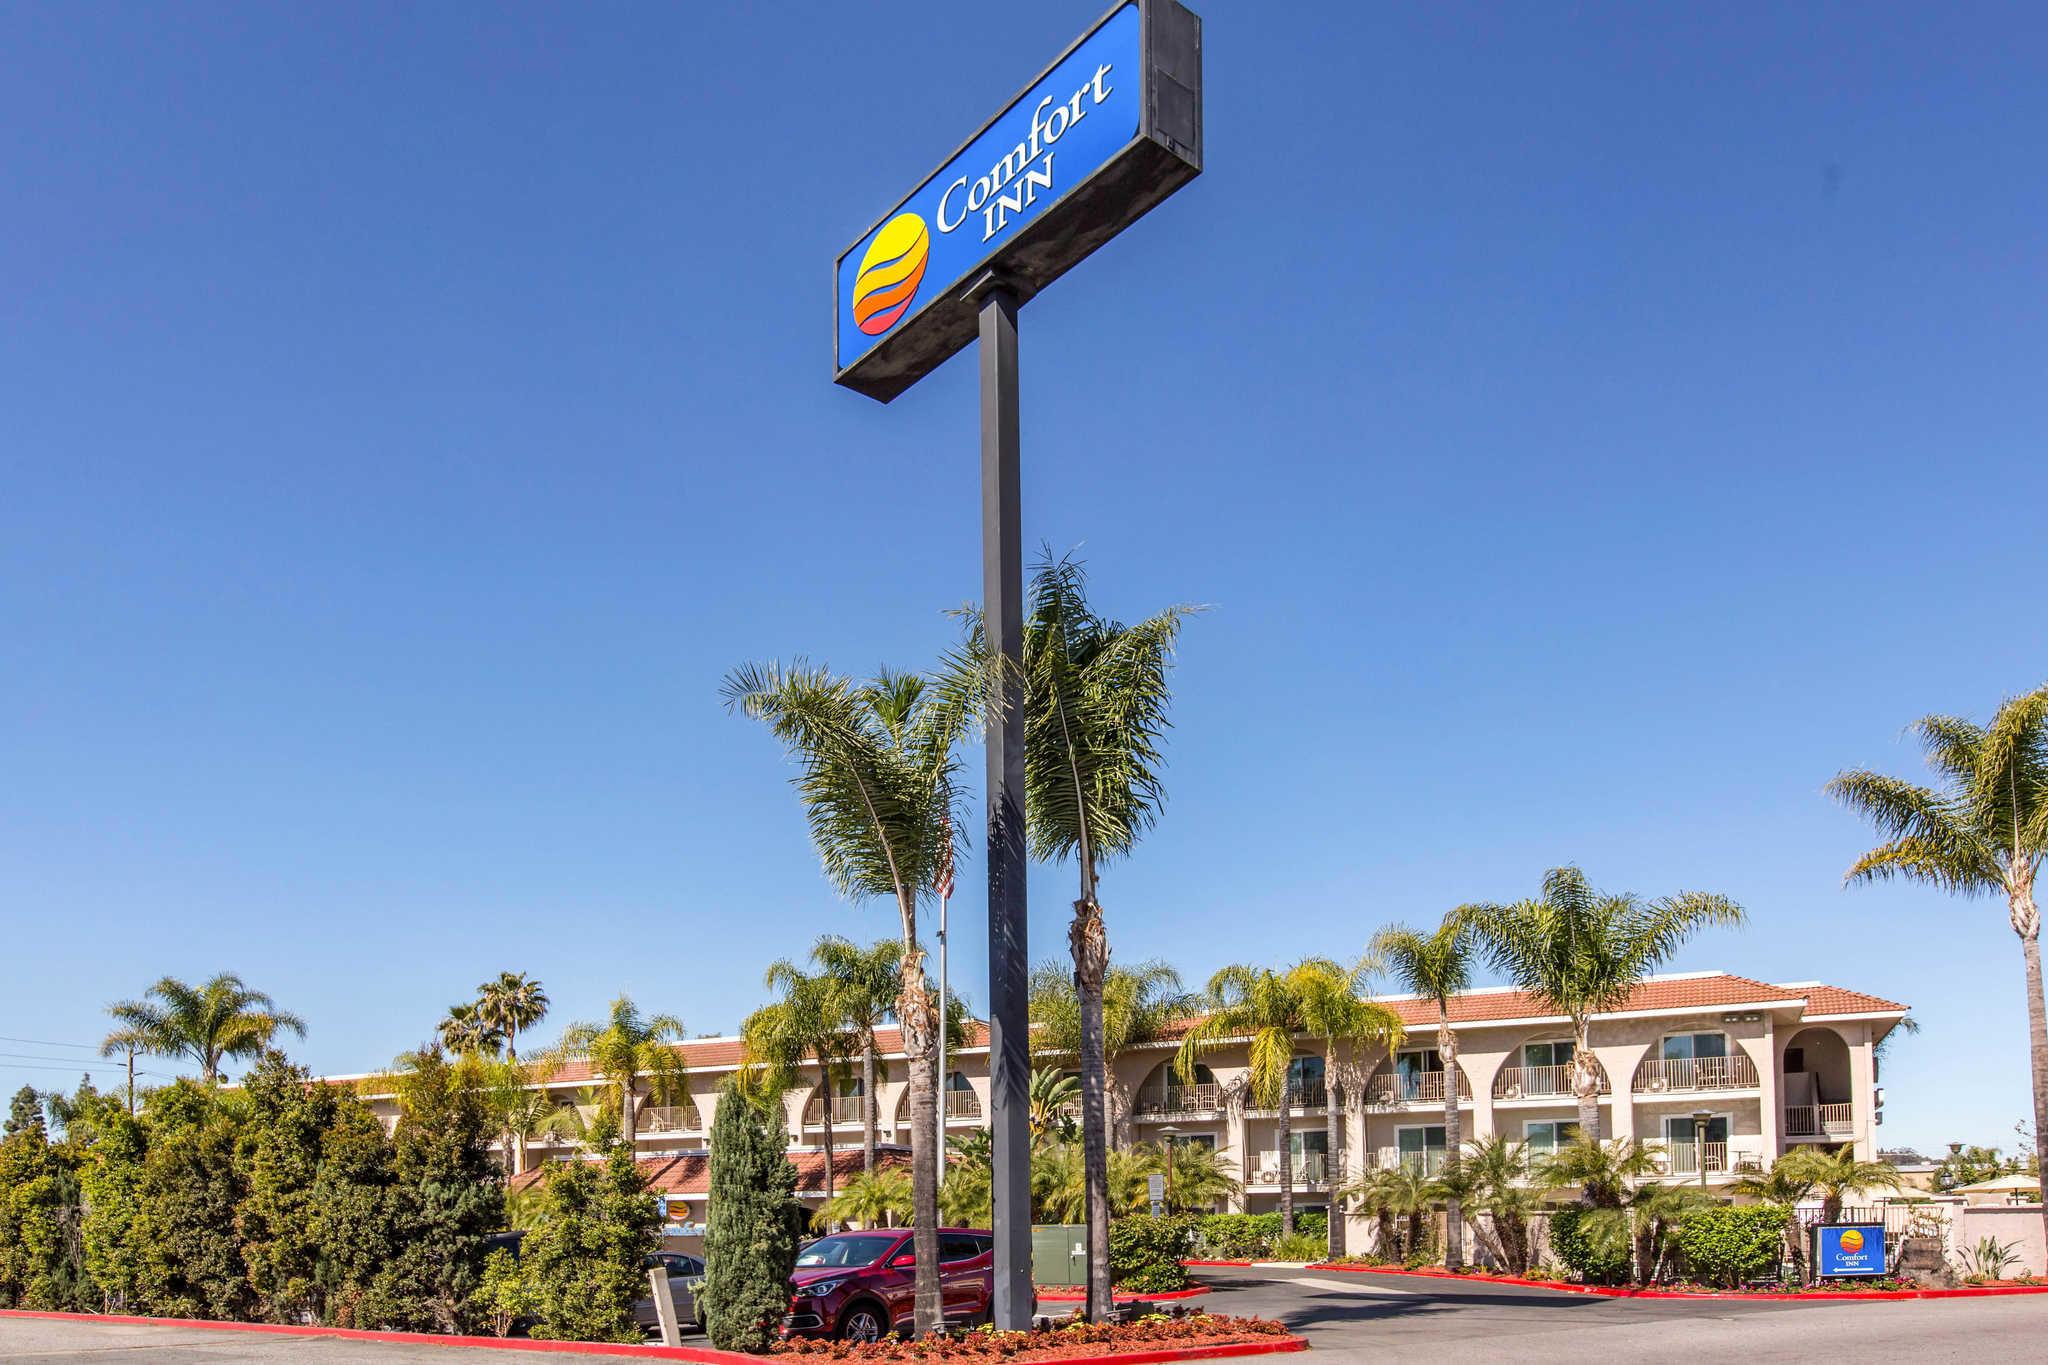 Comfort Inn Escondido San Diego North County image 1